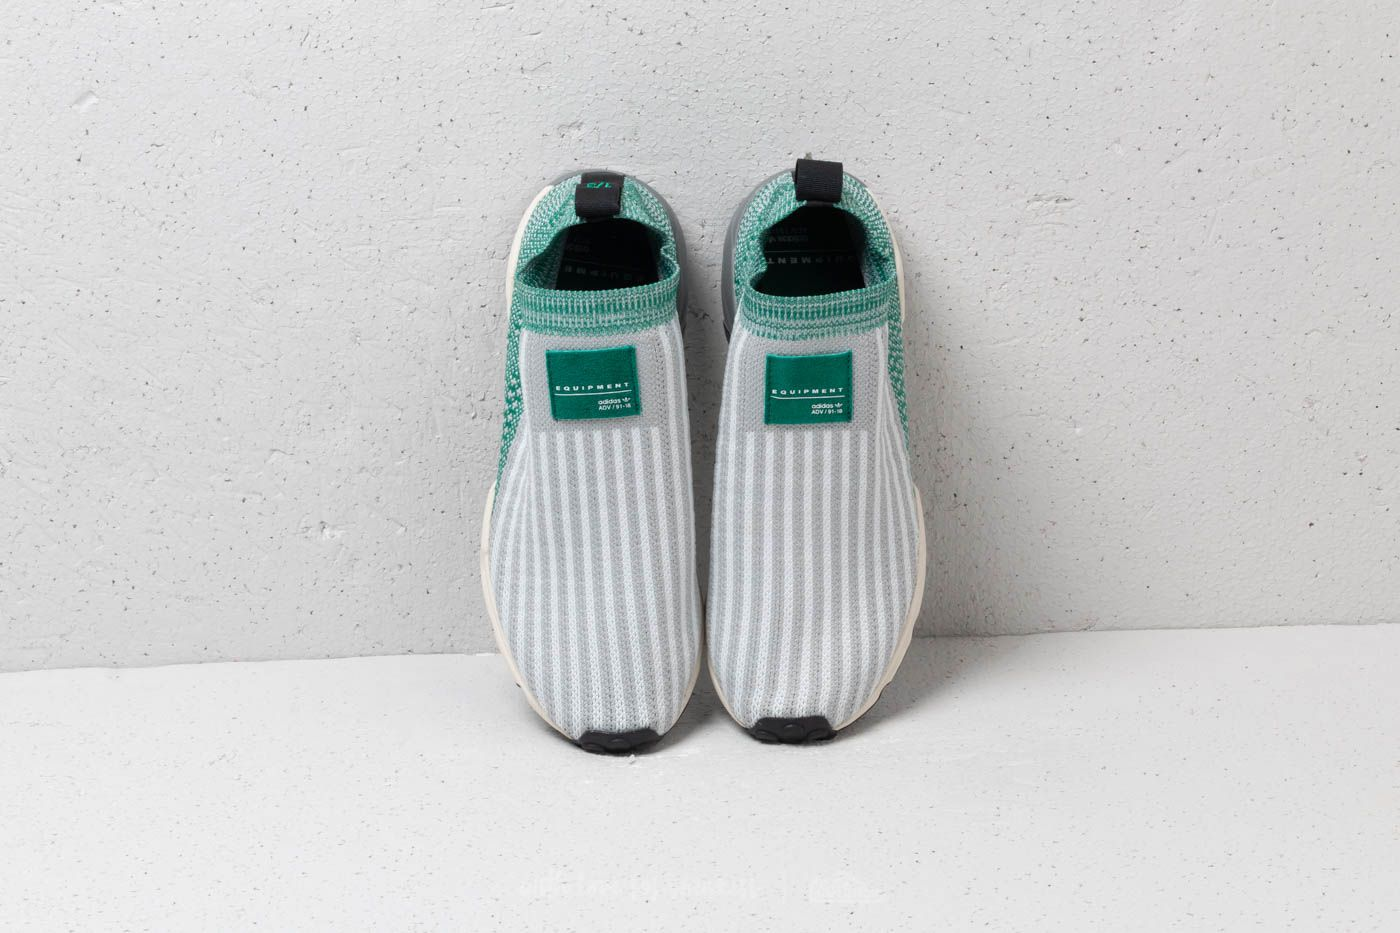 adidas EQT Support SK Primeknit Grey Two Ftw White Sub Green | Footshop